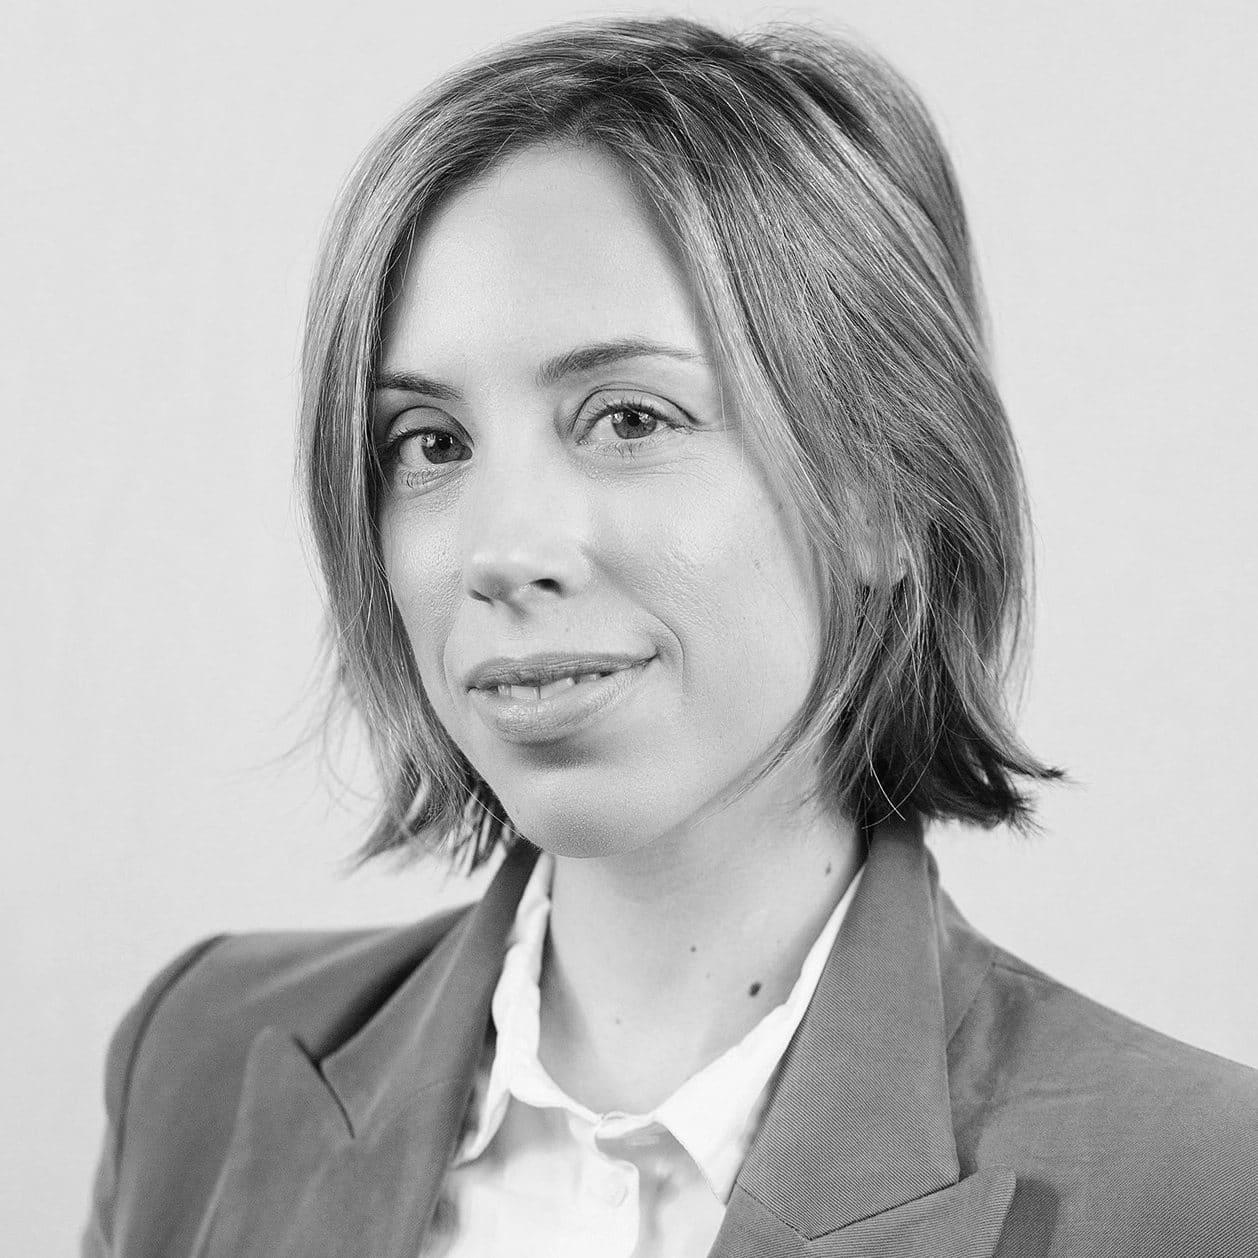 Lorena Muñoz-Alonso